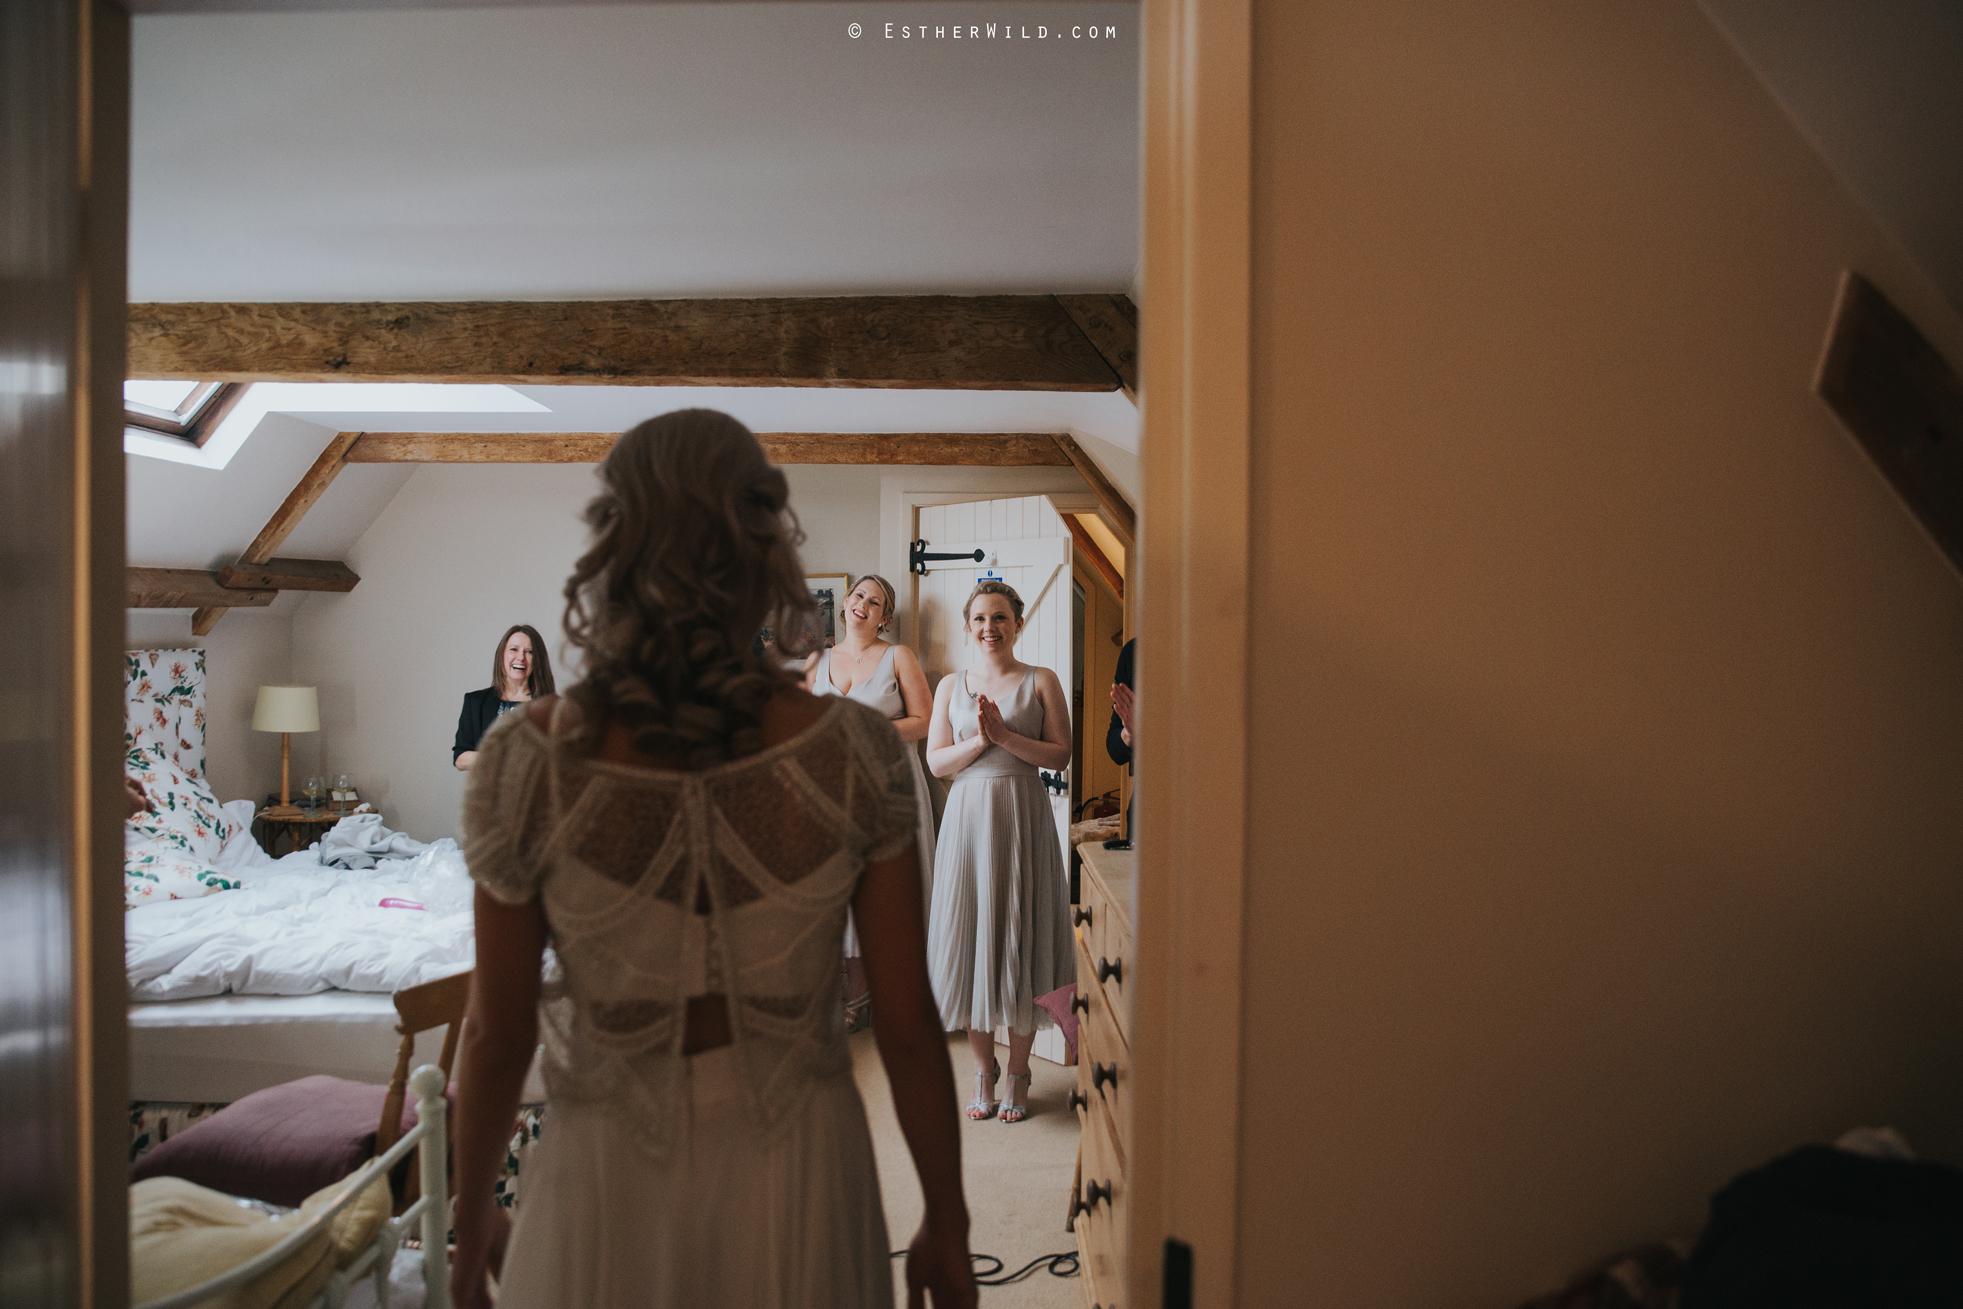 Elms_Barn_Weddings_Suffolk_Photographer_Copyright_Esther_Wild_IMG_0935.jpg